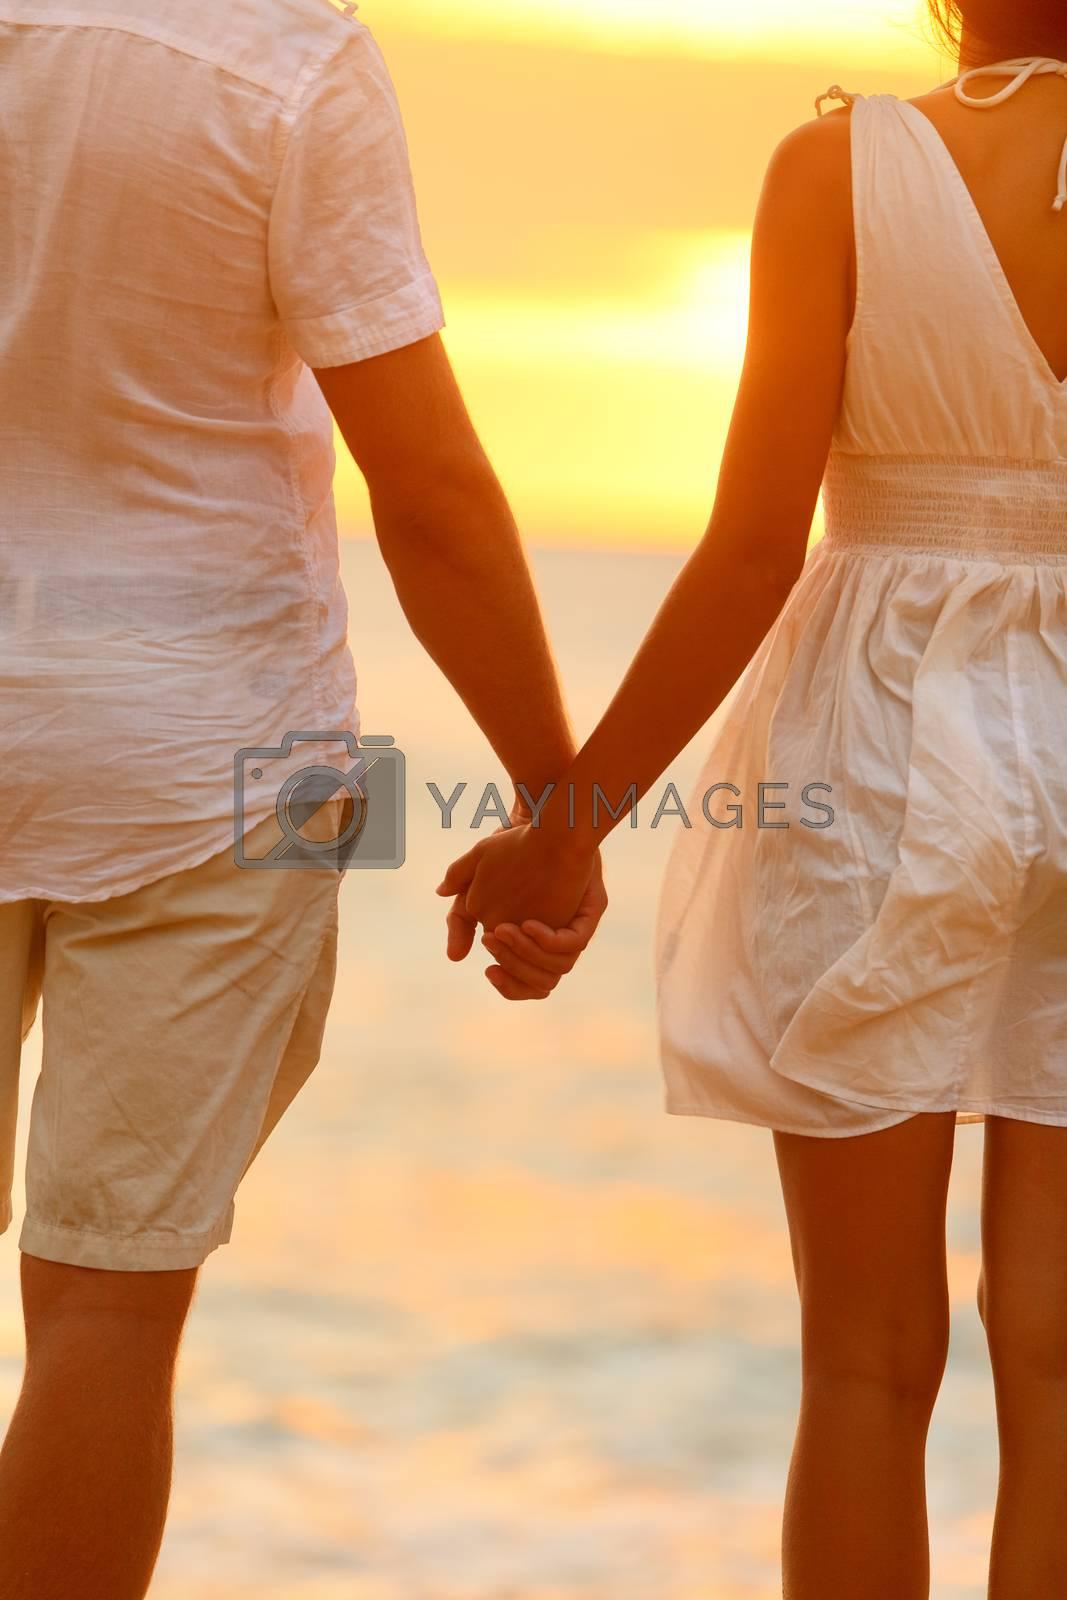 Romantic couple holding hands on beach sunset during travel. Happy woman and man in romance on honeymoon romance in beautiful sun light.